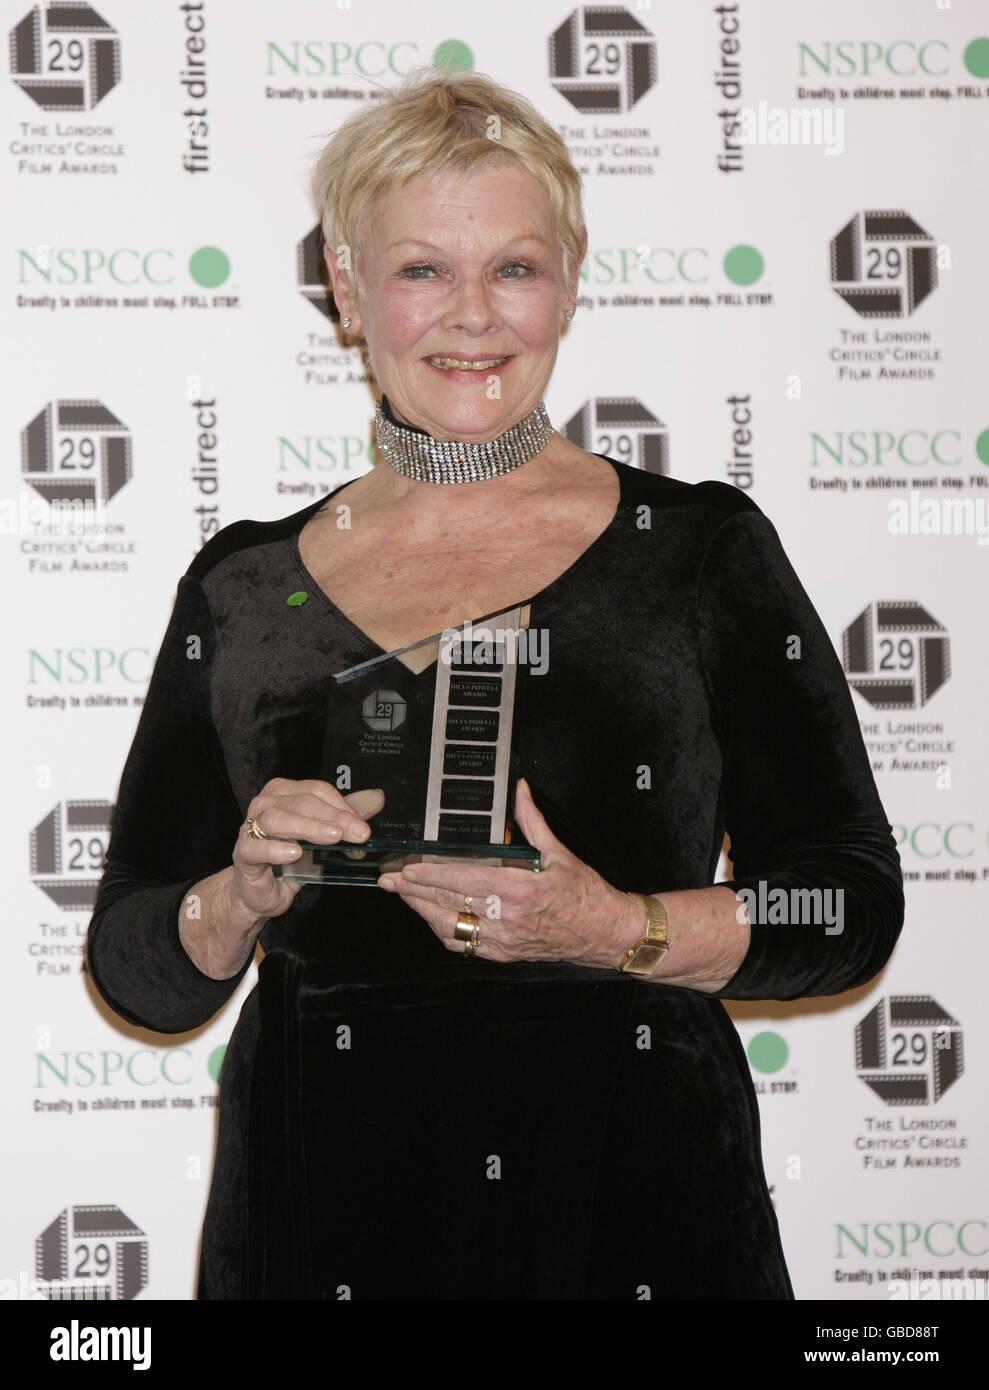 The London Critics' Circle Film Awards - London Stock Photo